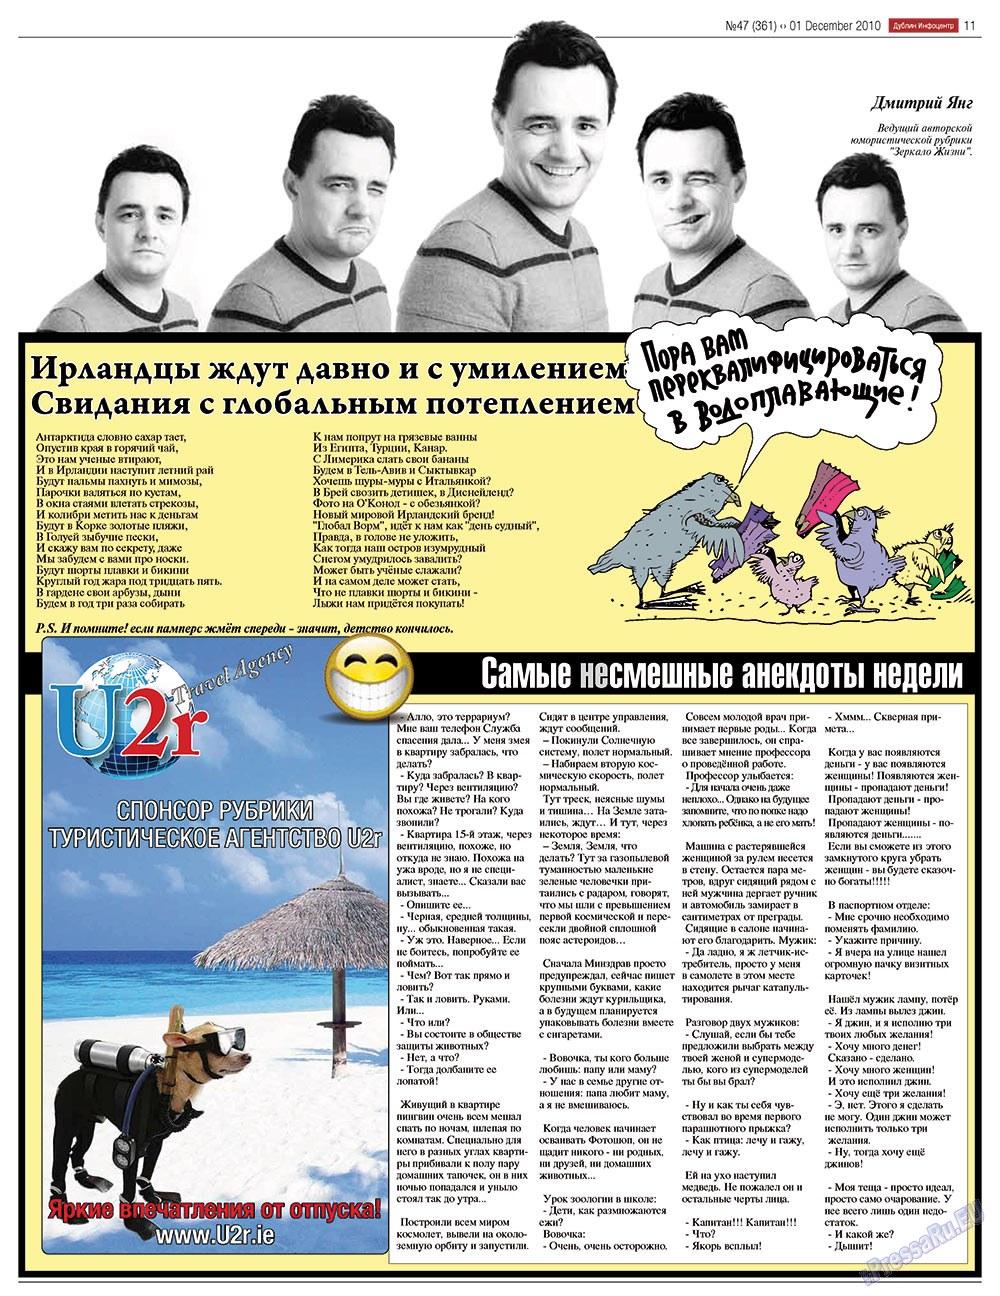 Дублин инфоцентр (газета). 2010 год, номер 47, стр. 11